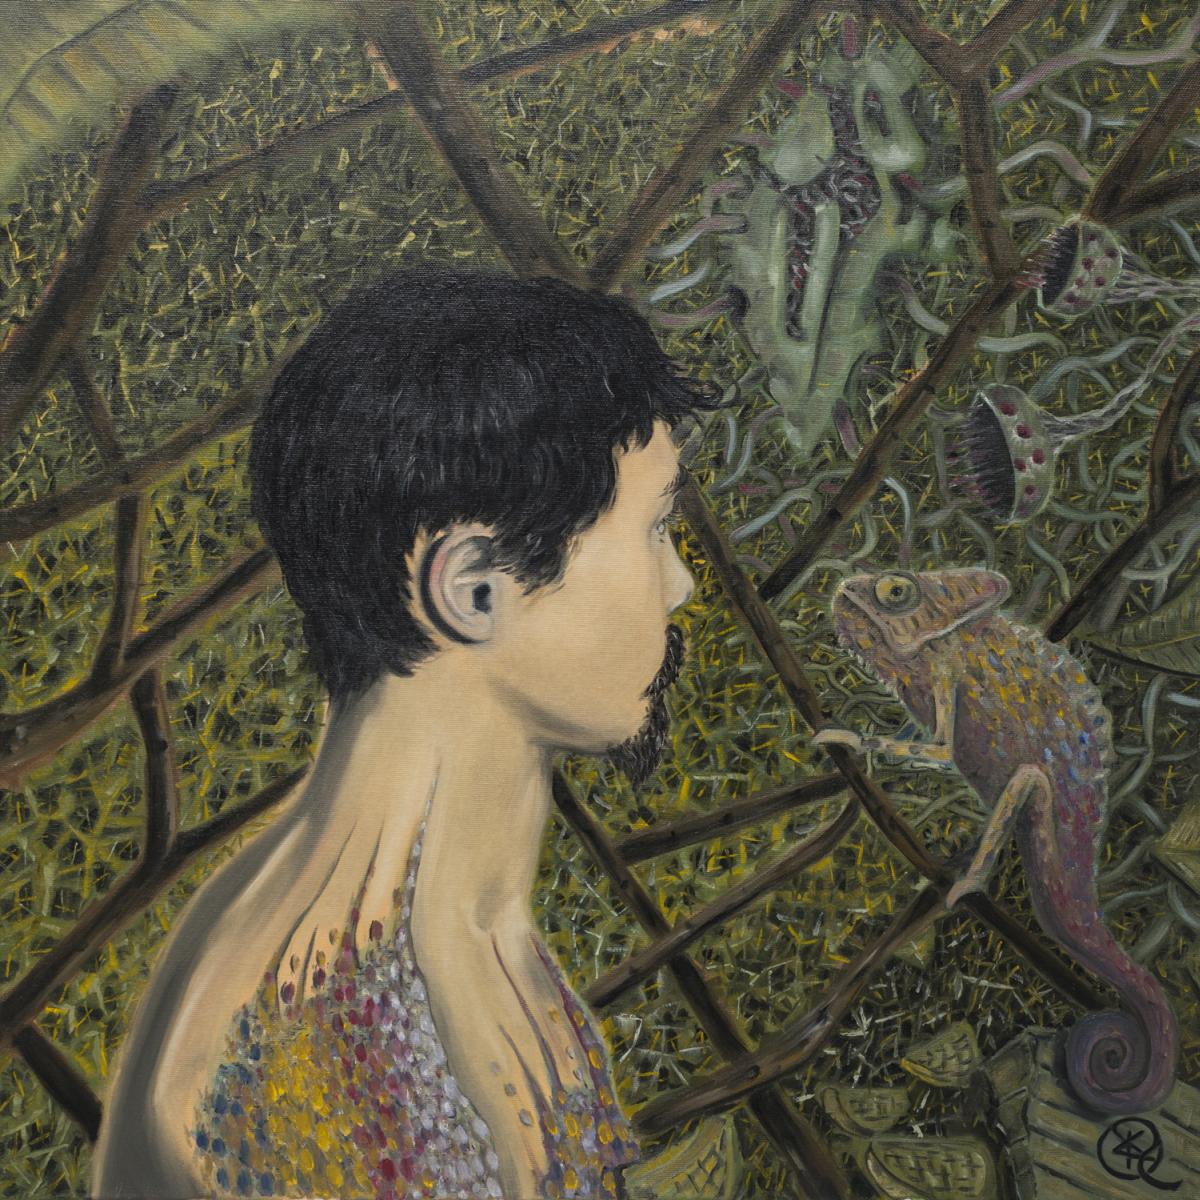 Dusza Kameleona, 2014